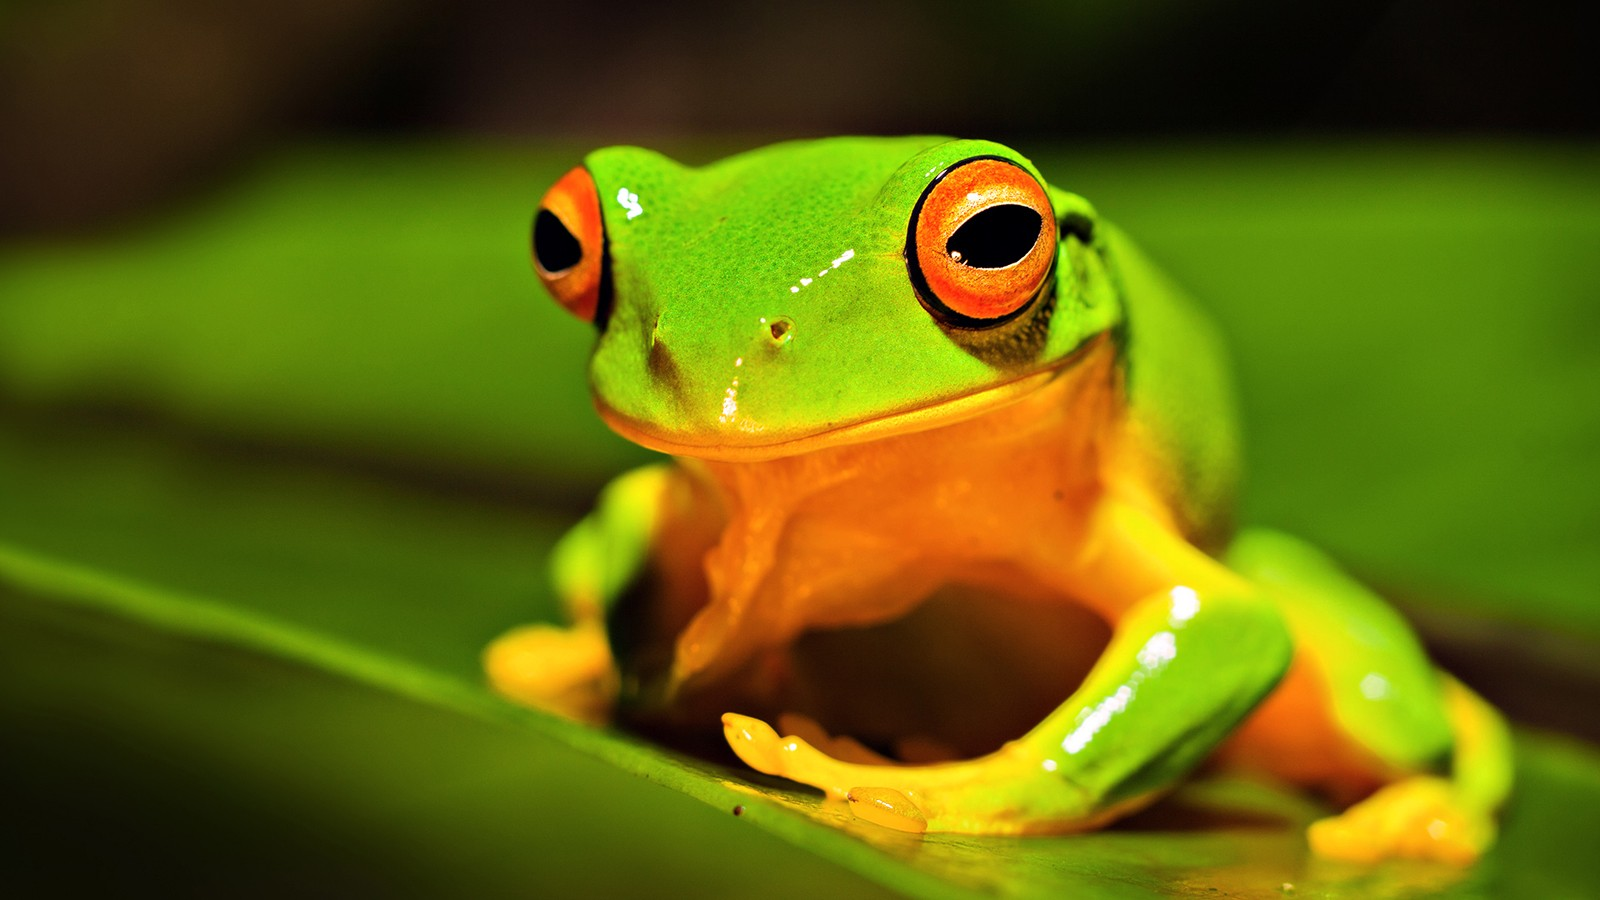 green frog animal wallpapers   HD Wallpaper 1600x900